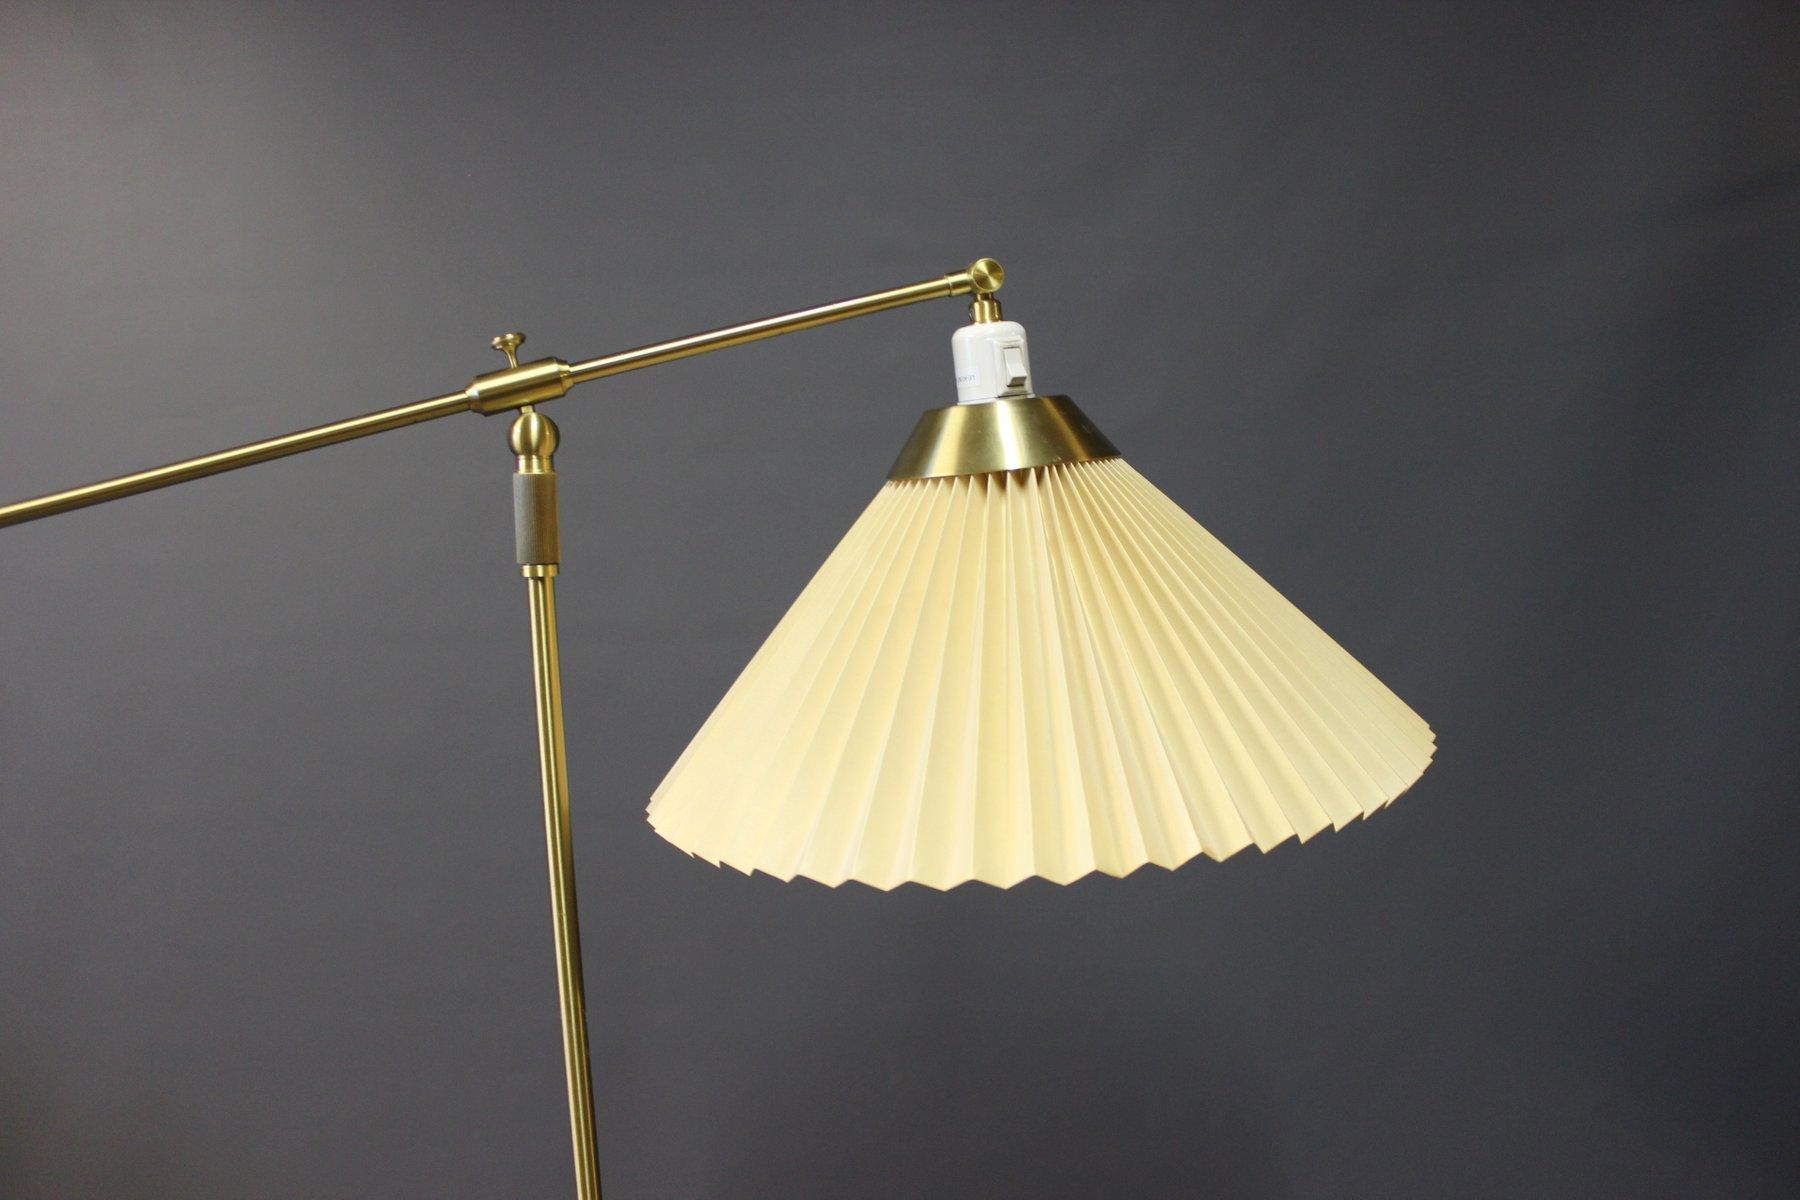 Model 349 Floor Lamp by Aage Petersen for Le Klint 1980s for sale